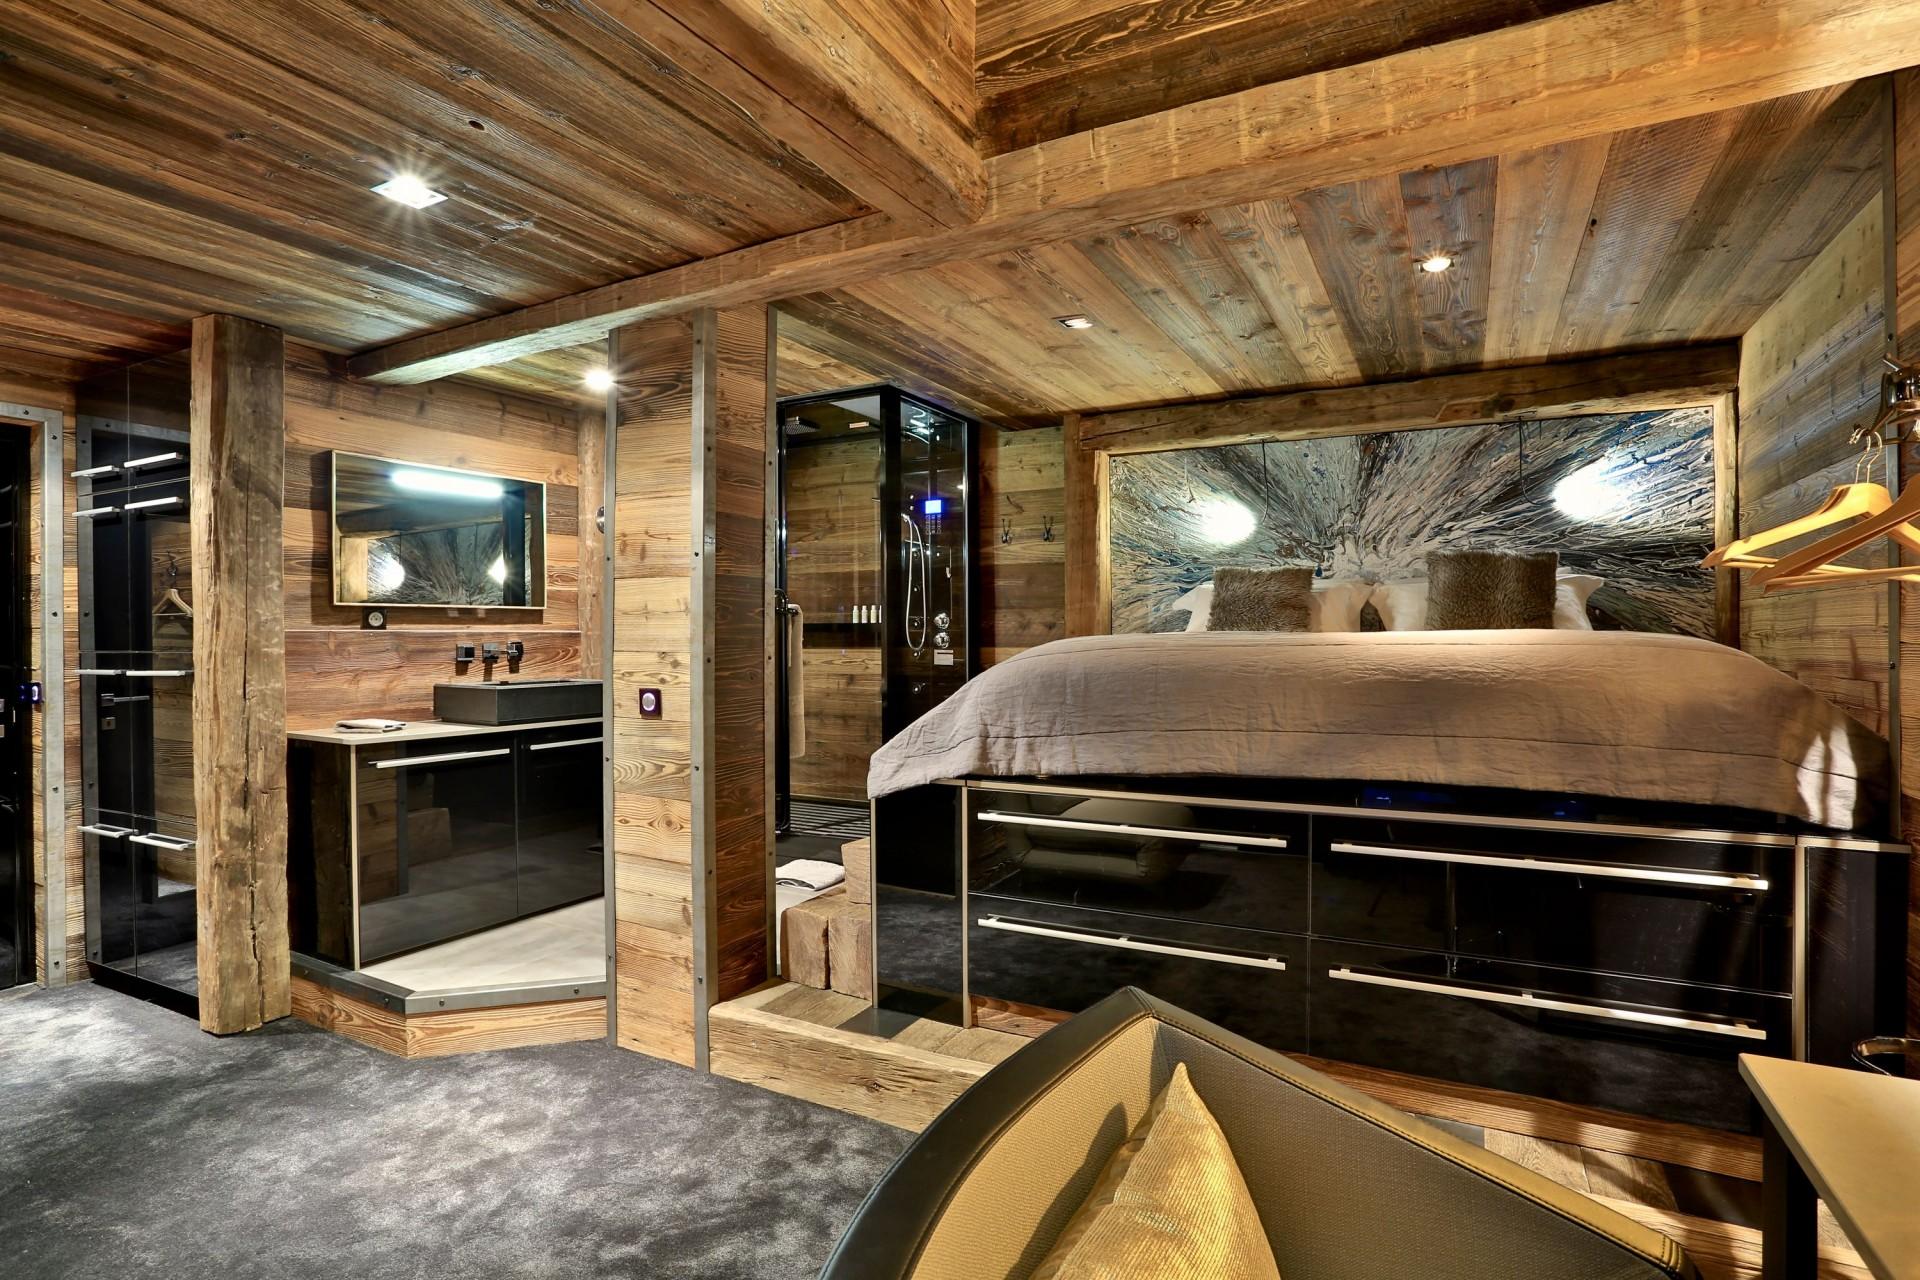 Tignes Location Chalet Luxe Tirodite Chambre6